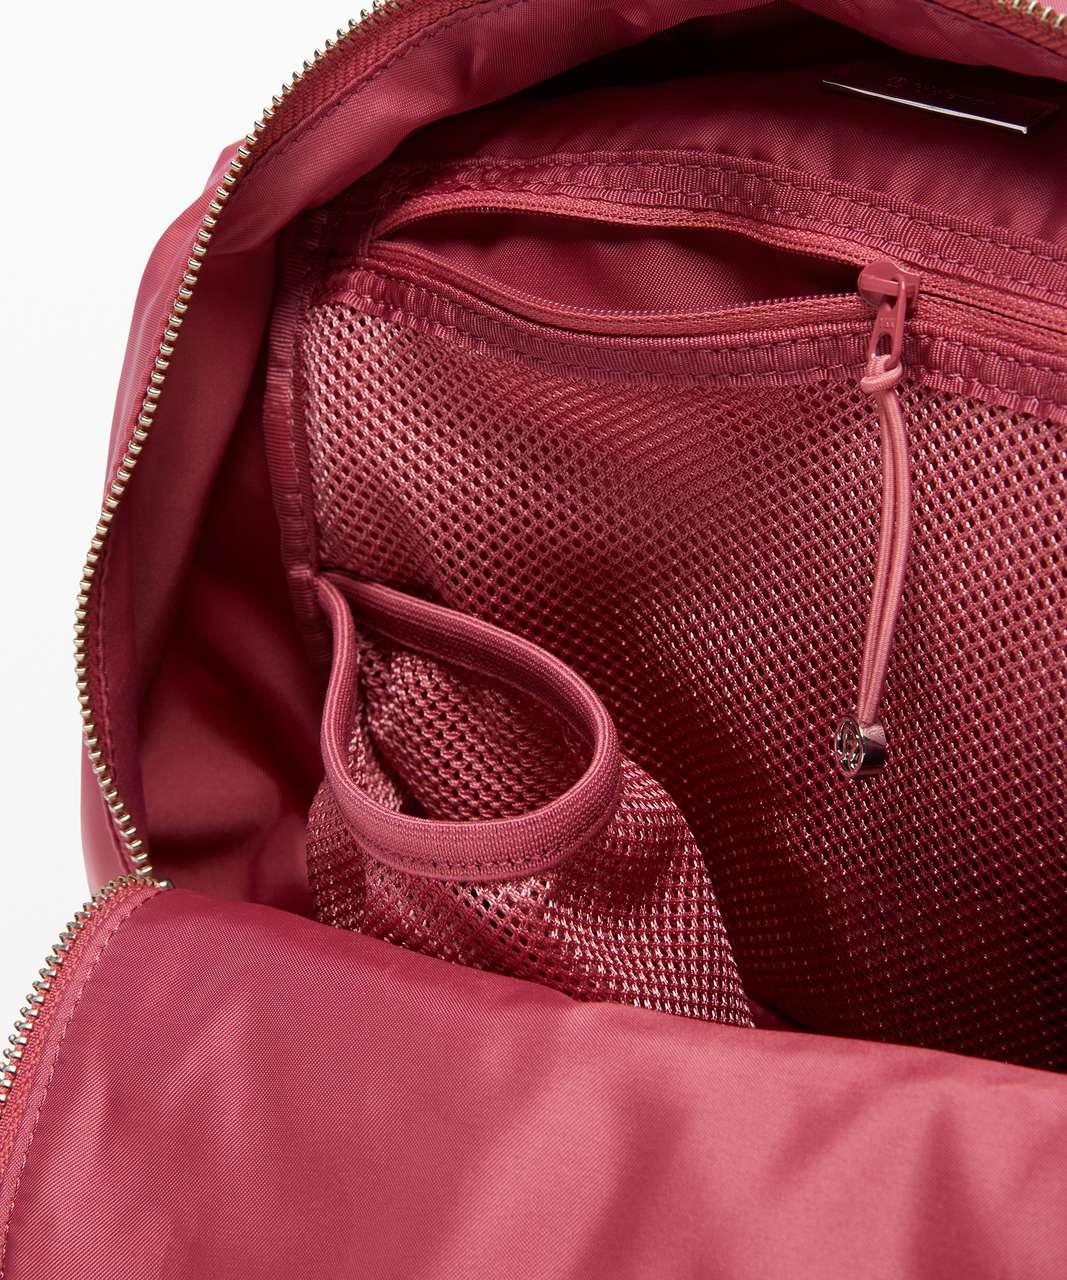 Lululemon City Adventurer Backpack Mini *10L - Cherry Tint